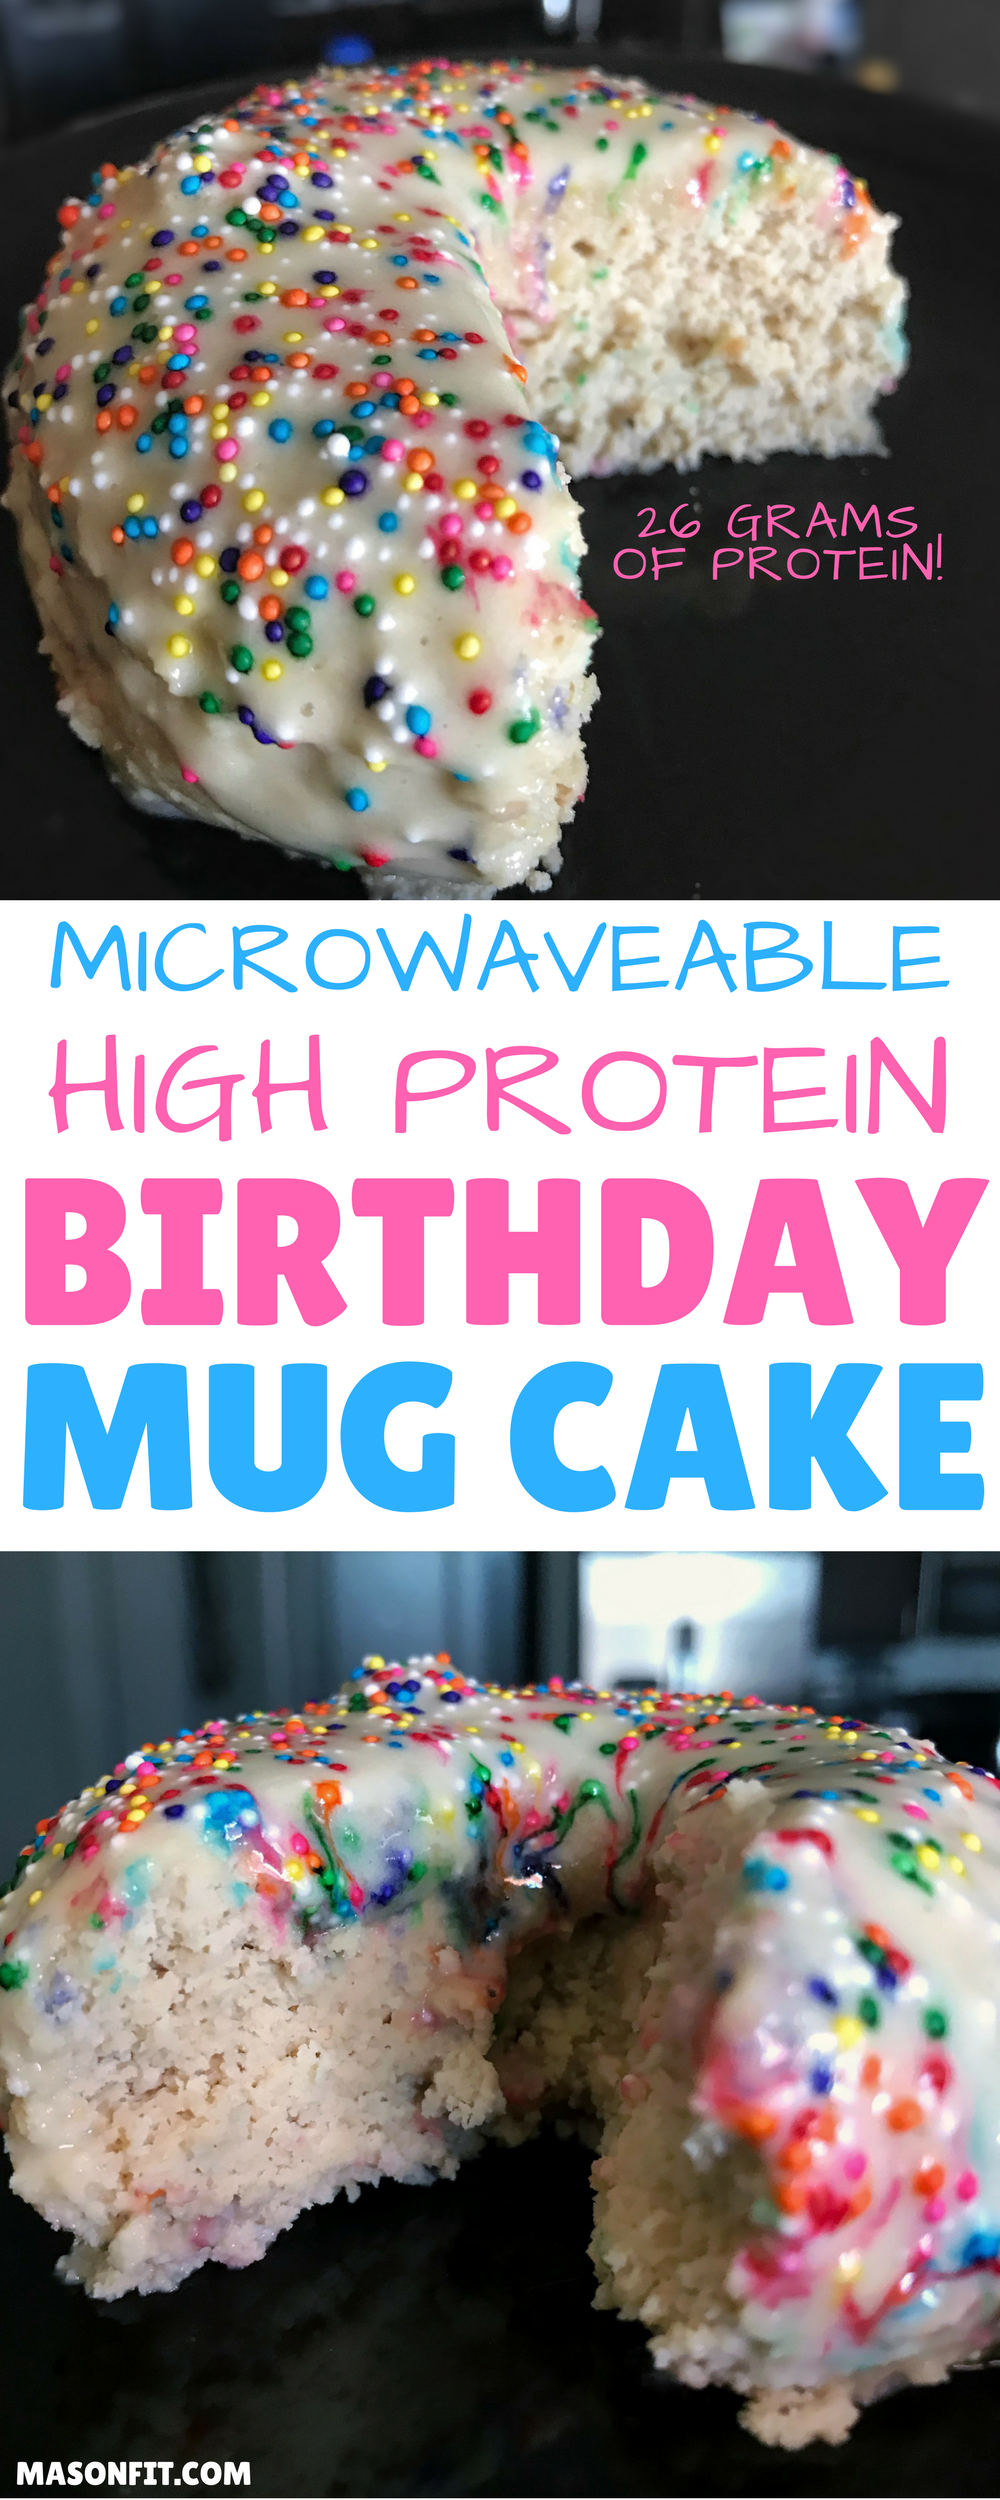 Astonishing A Mug Cake Recipe For High Protein Birthday Cake Thats Ready In Funny Birthday Cards Online Chimdamsfinfo